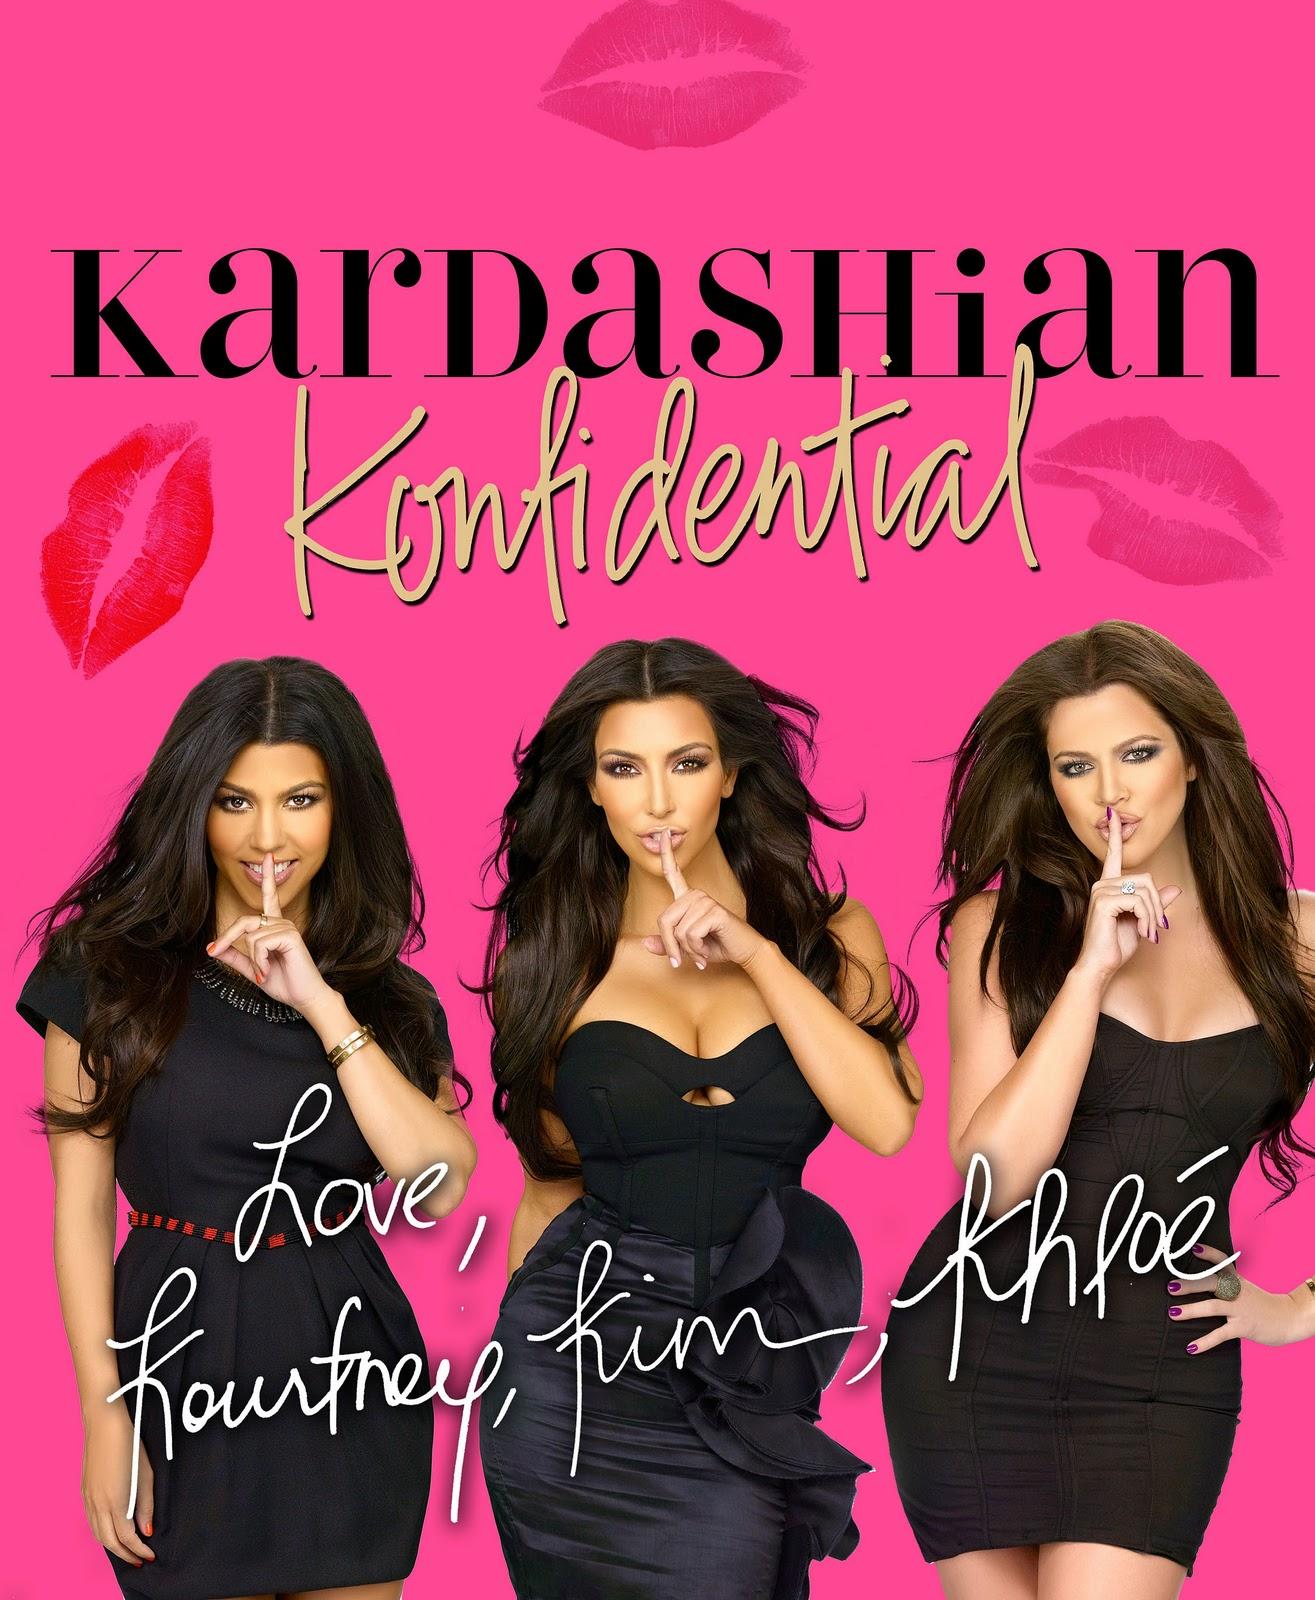 http://4.bp.blogspot.com/_lE4xDJ1ygtI/TPhb9KyH7ZI/AAAAAAAAAkI/HQBzJccGHXQ/s1600/kardashian.jpg